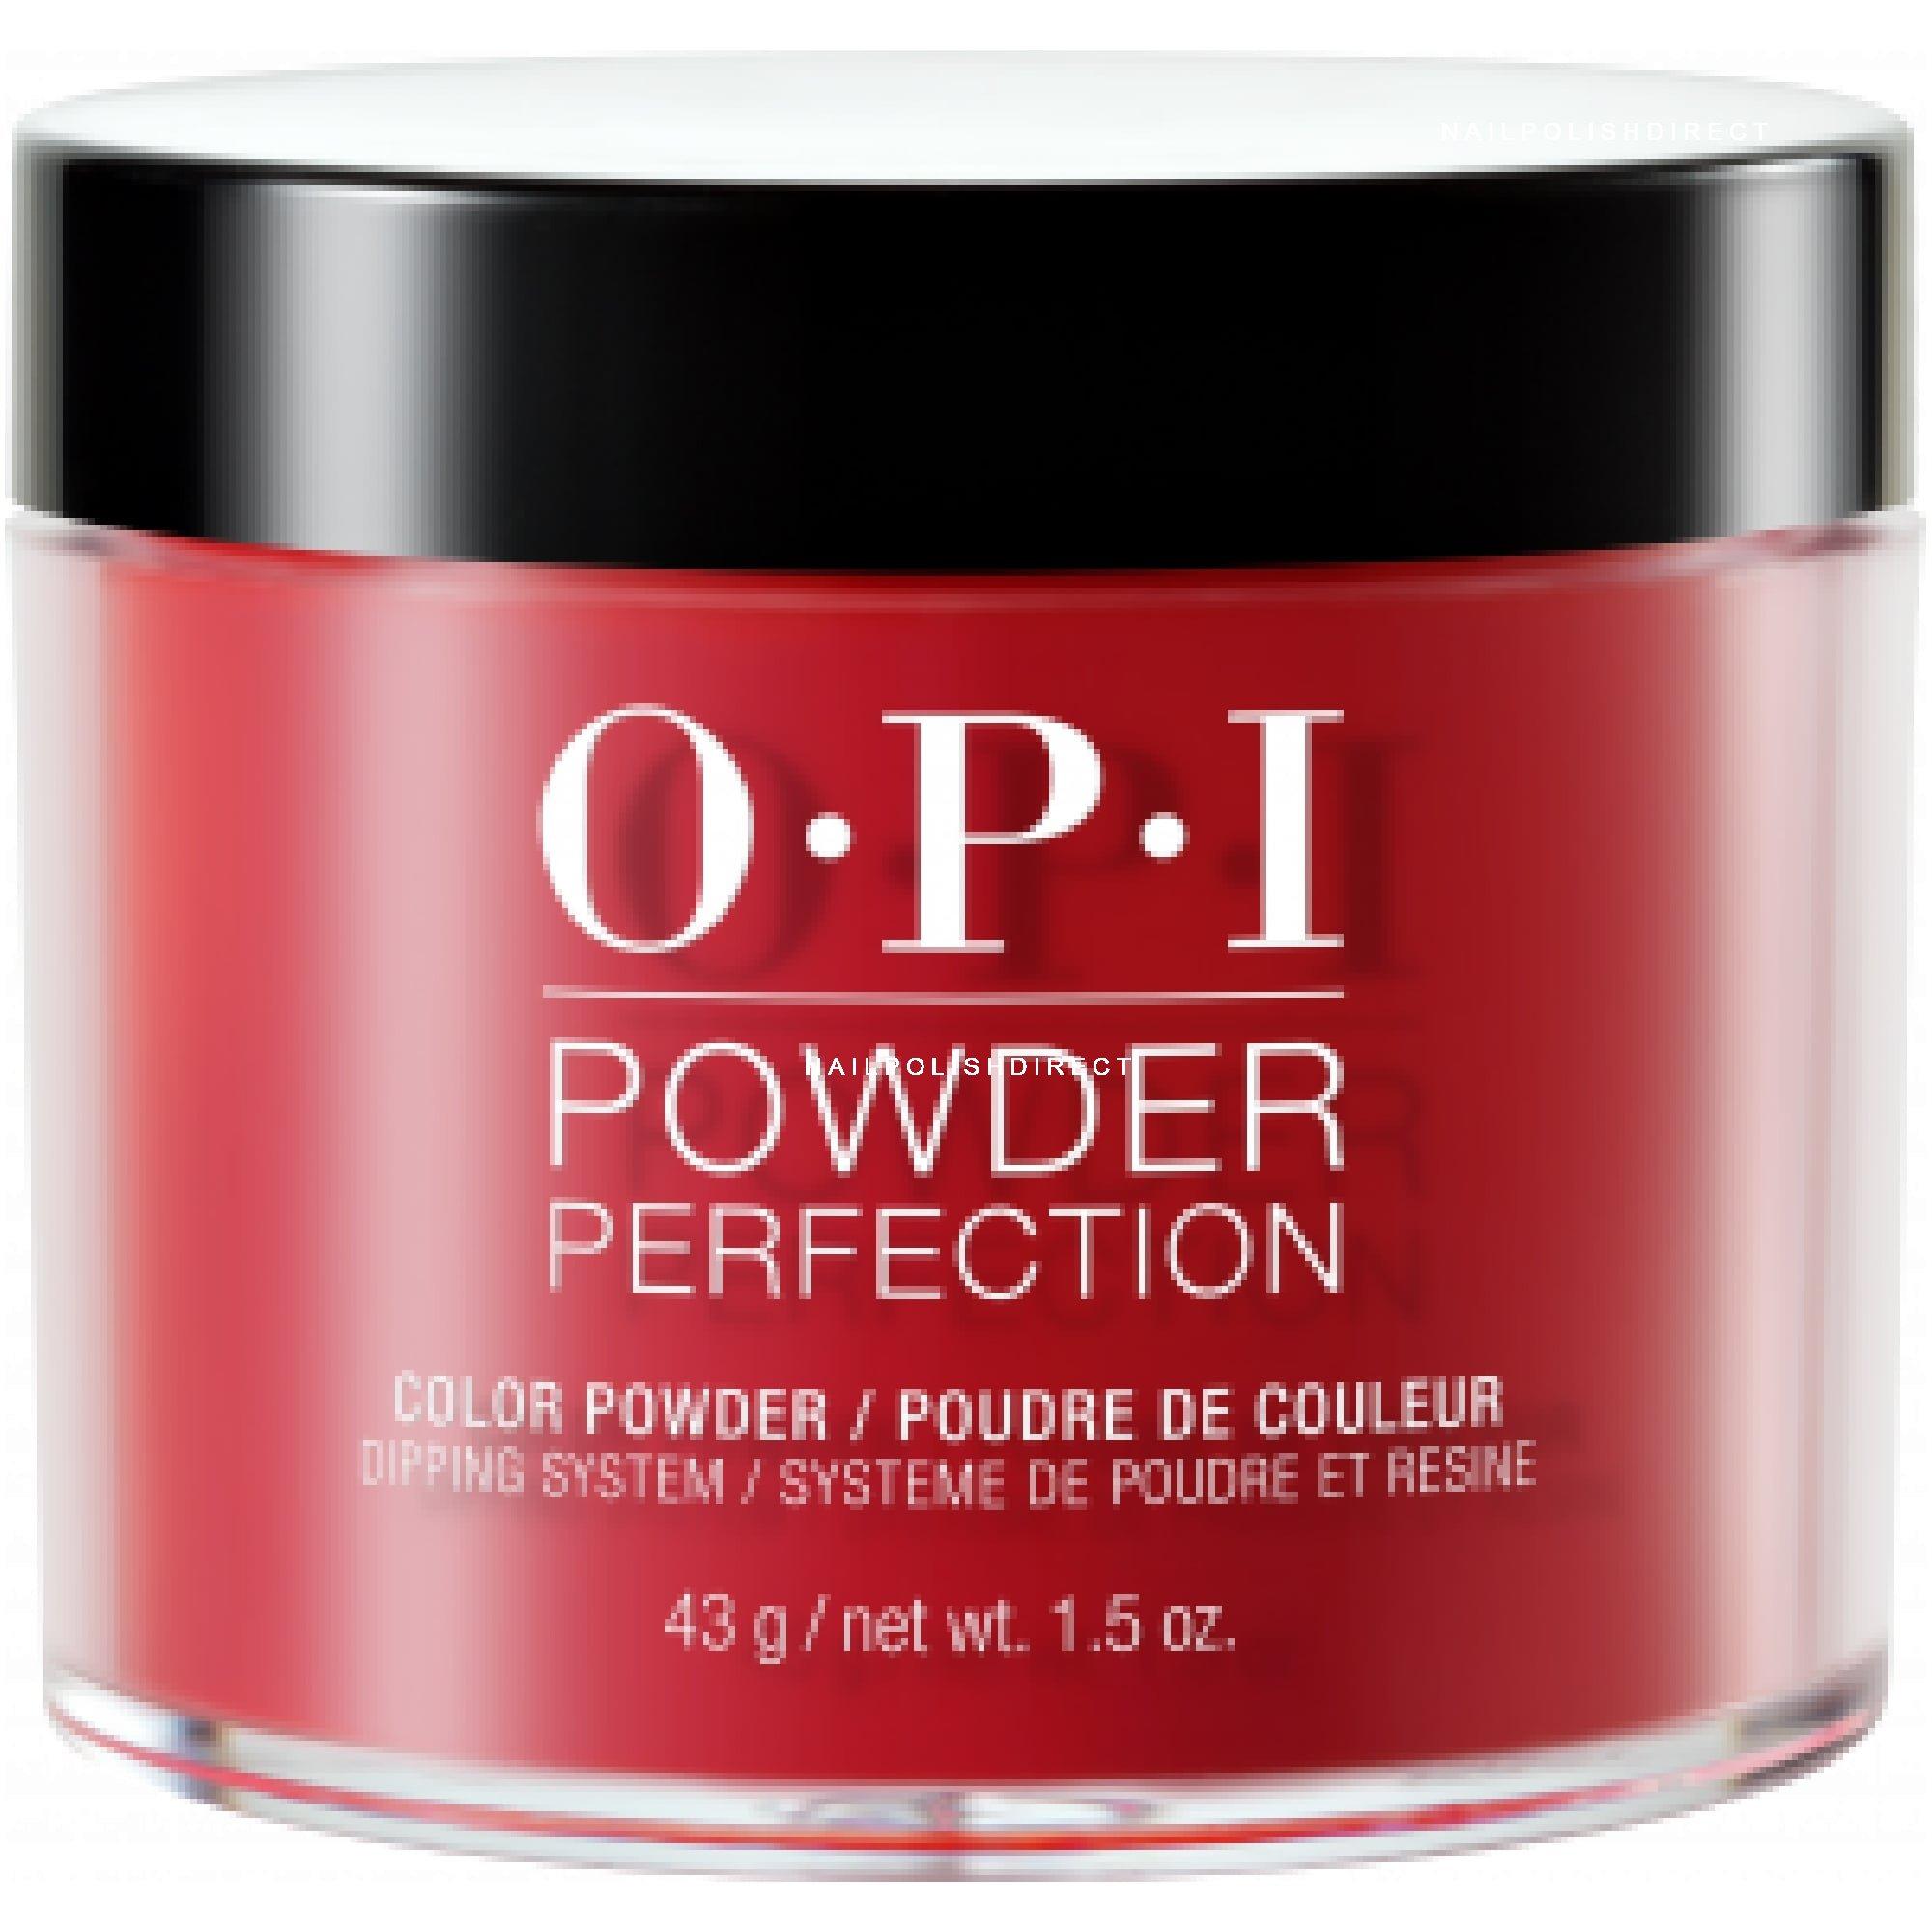 Opi Powder Nail Polish Kit: The Thrill Of Brazil (DP A16) 43g